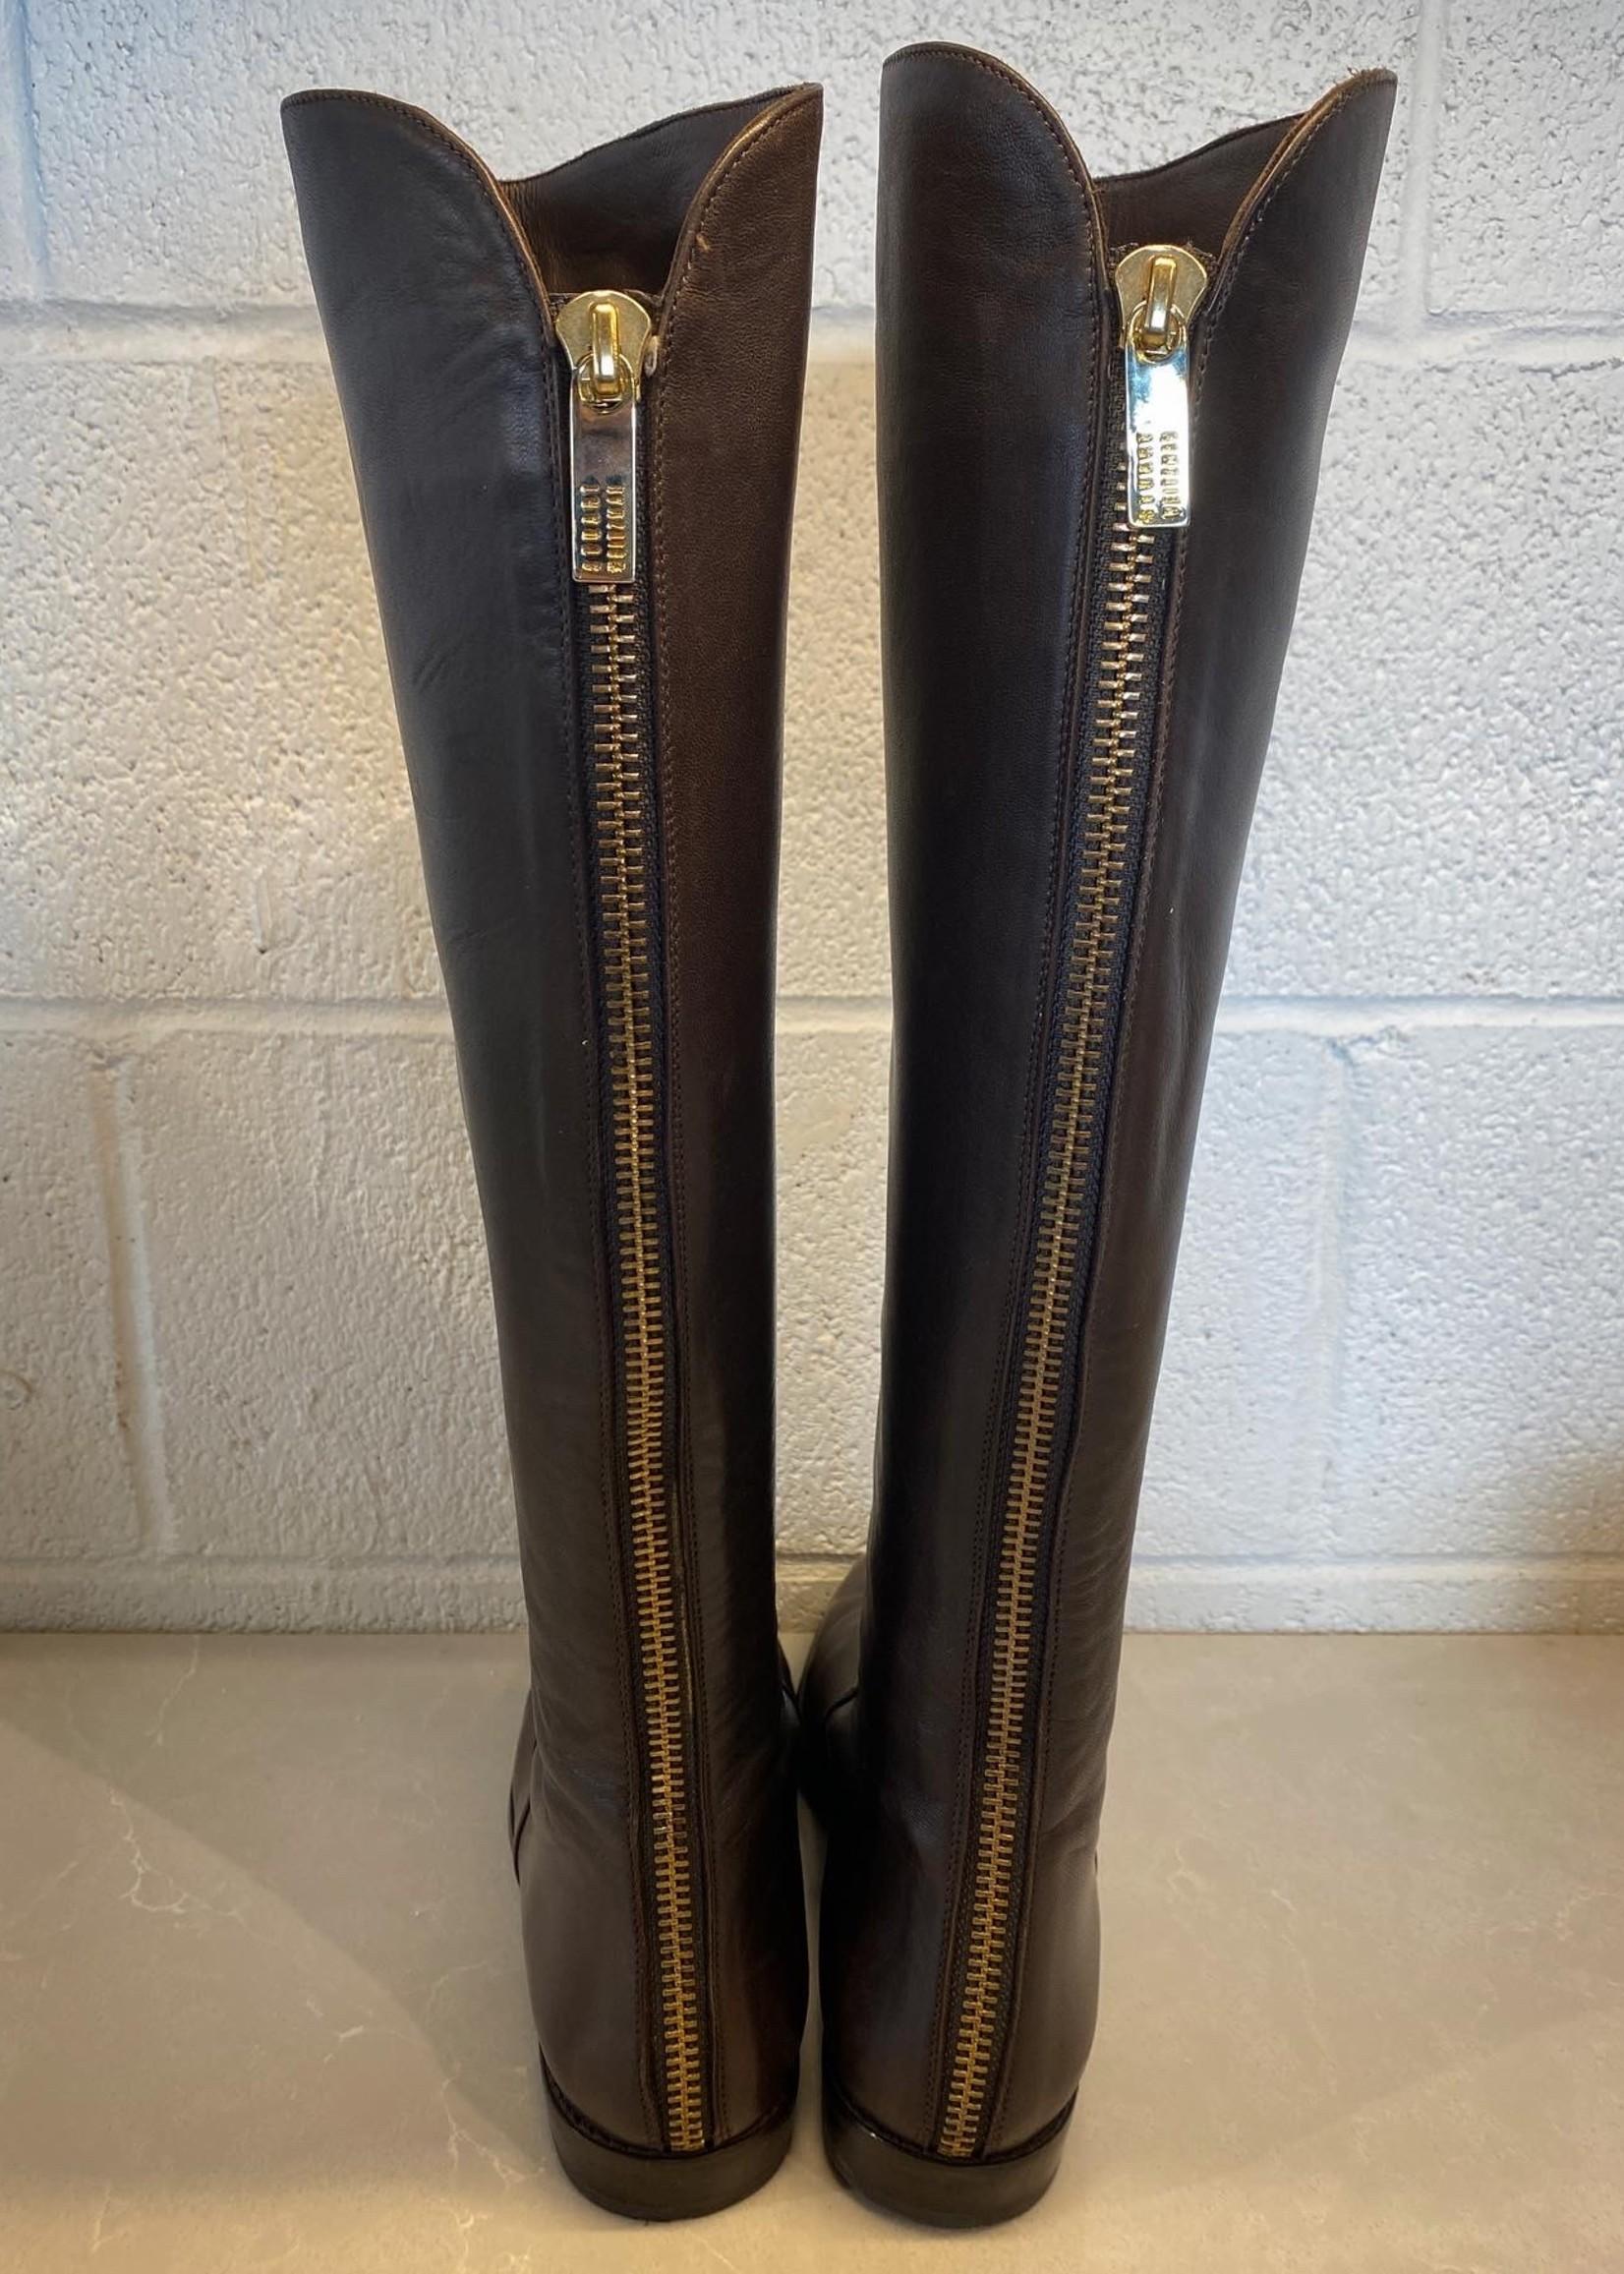 Stuart Weitzman Brown Leather Boots 8